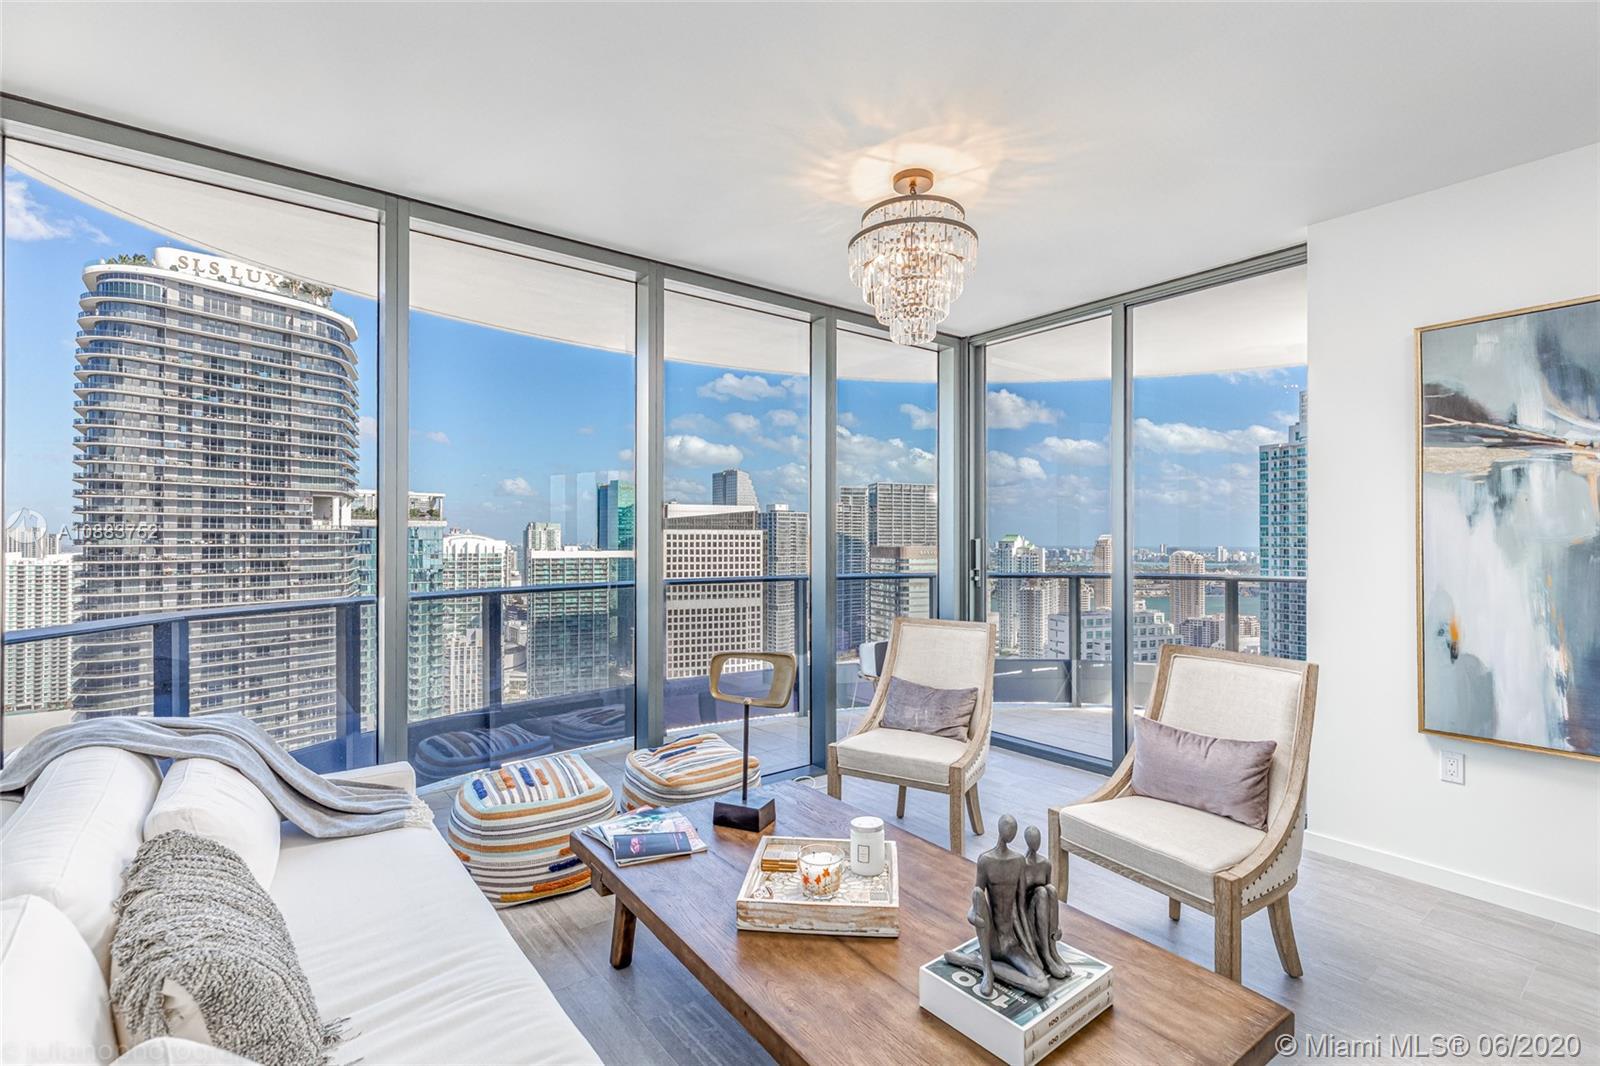 1000 Brickell Plaza # 4615, Miami, Florida 33131, 2 Bedrooms Bedrooms, ,3 BathroomsBathrooms,Residential,For Sale,1000 Brickell Plaza # 4615,A10883752